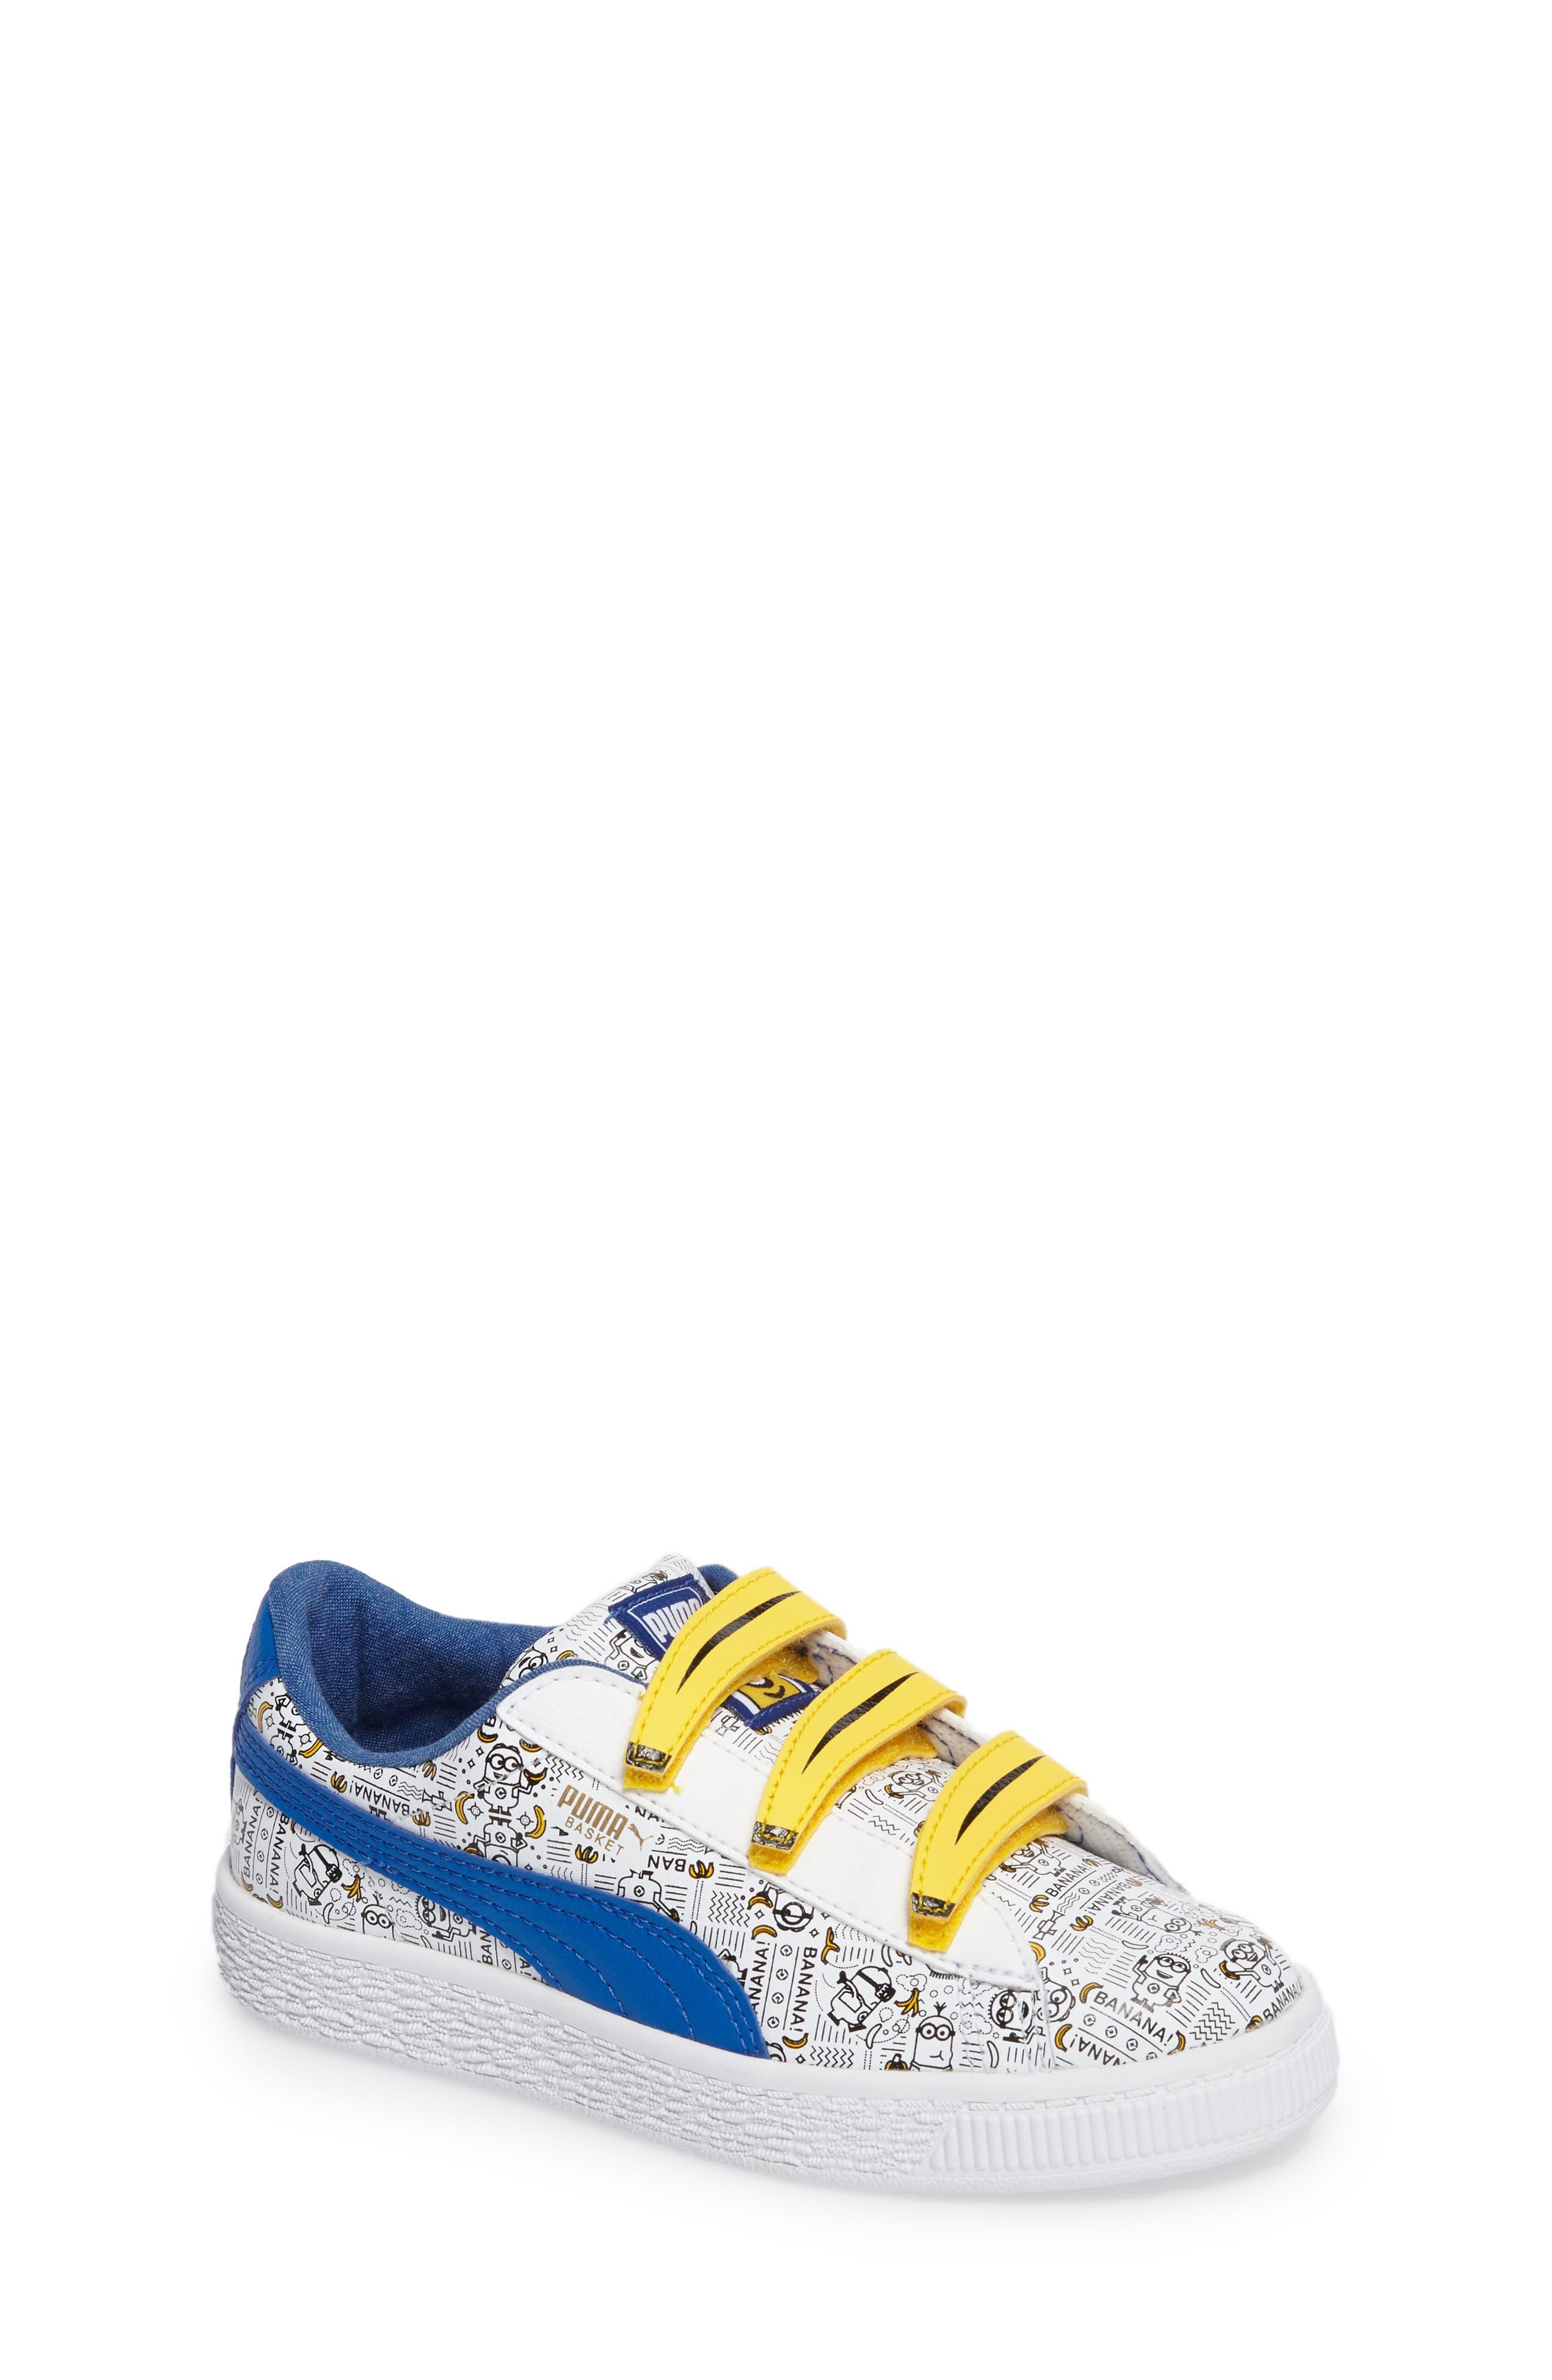 Minions Basket V Sneaker,                         Main,                         color, 100